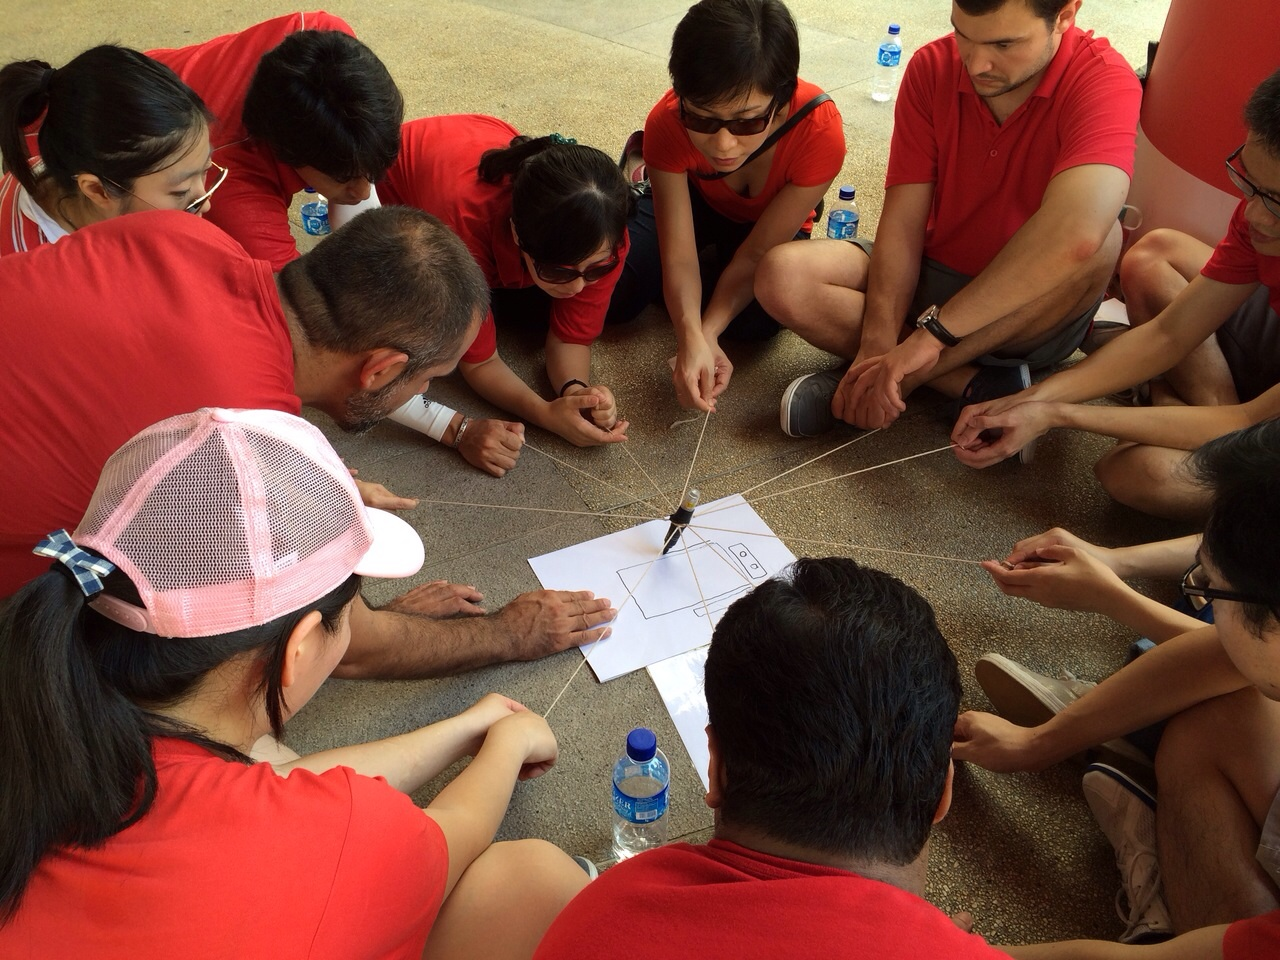 amazing race teambuilding activity